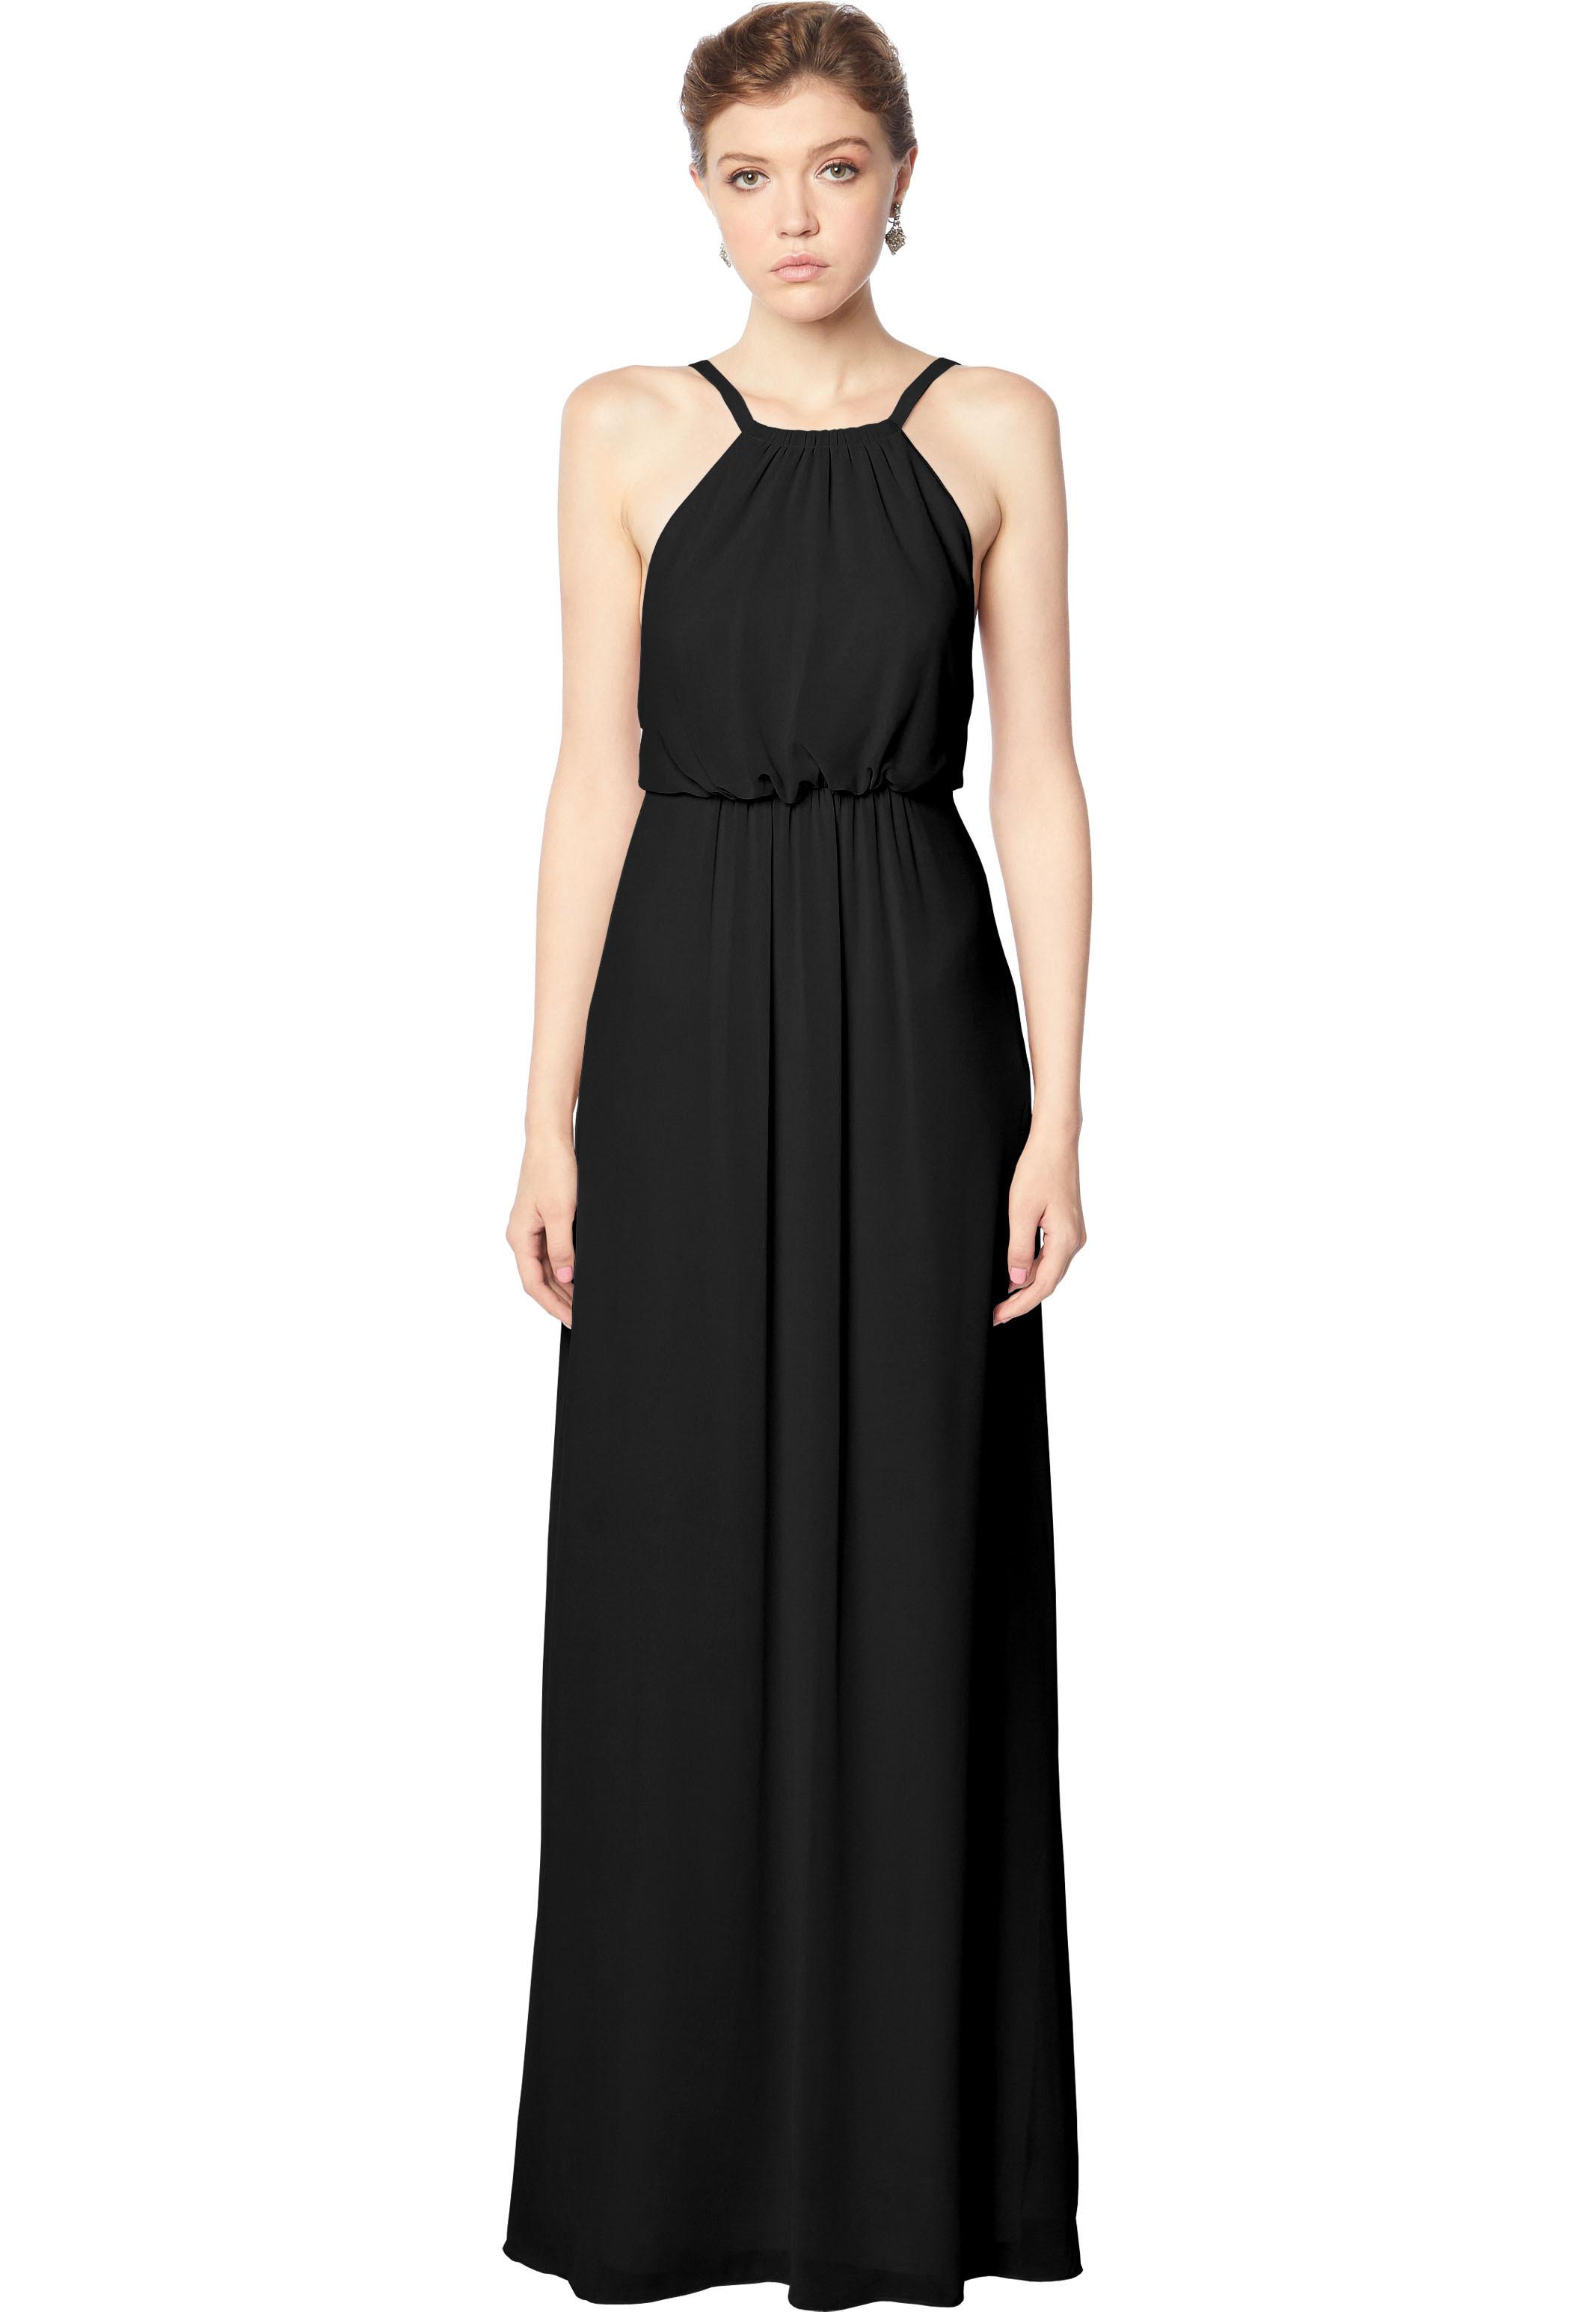 Bill Levkoff BLACK Chiffon Blouson A-line gown, $158.00 Front